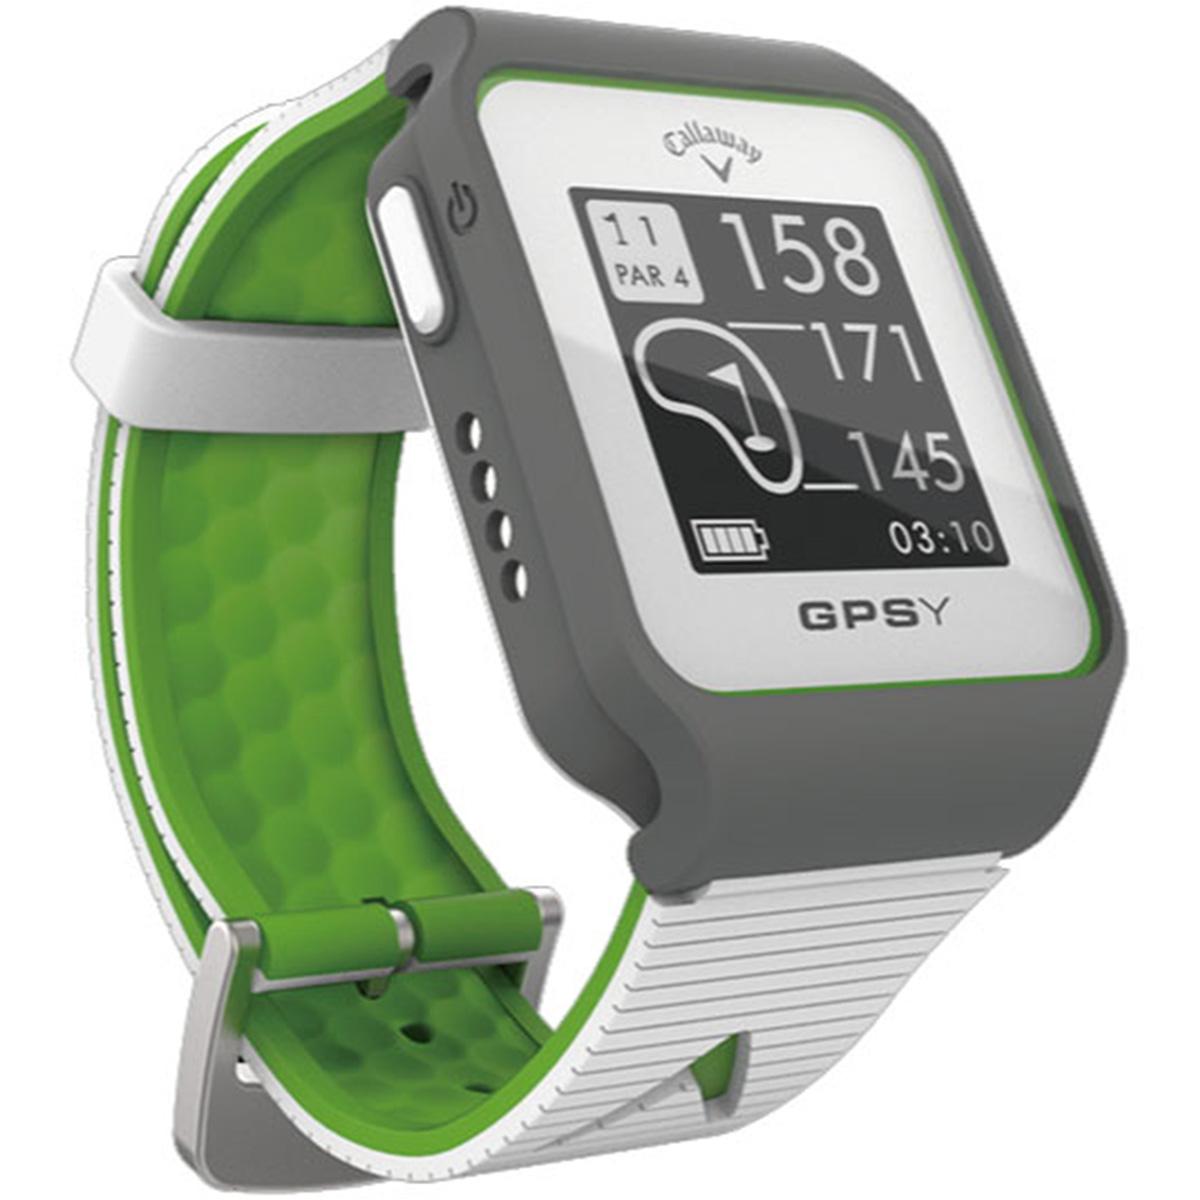 GPSy WATCH